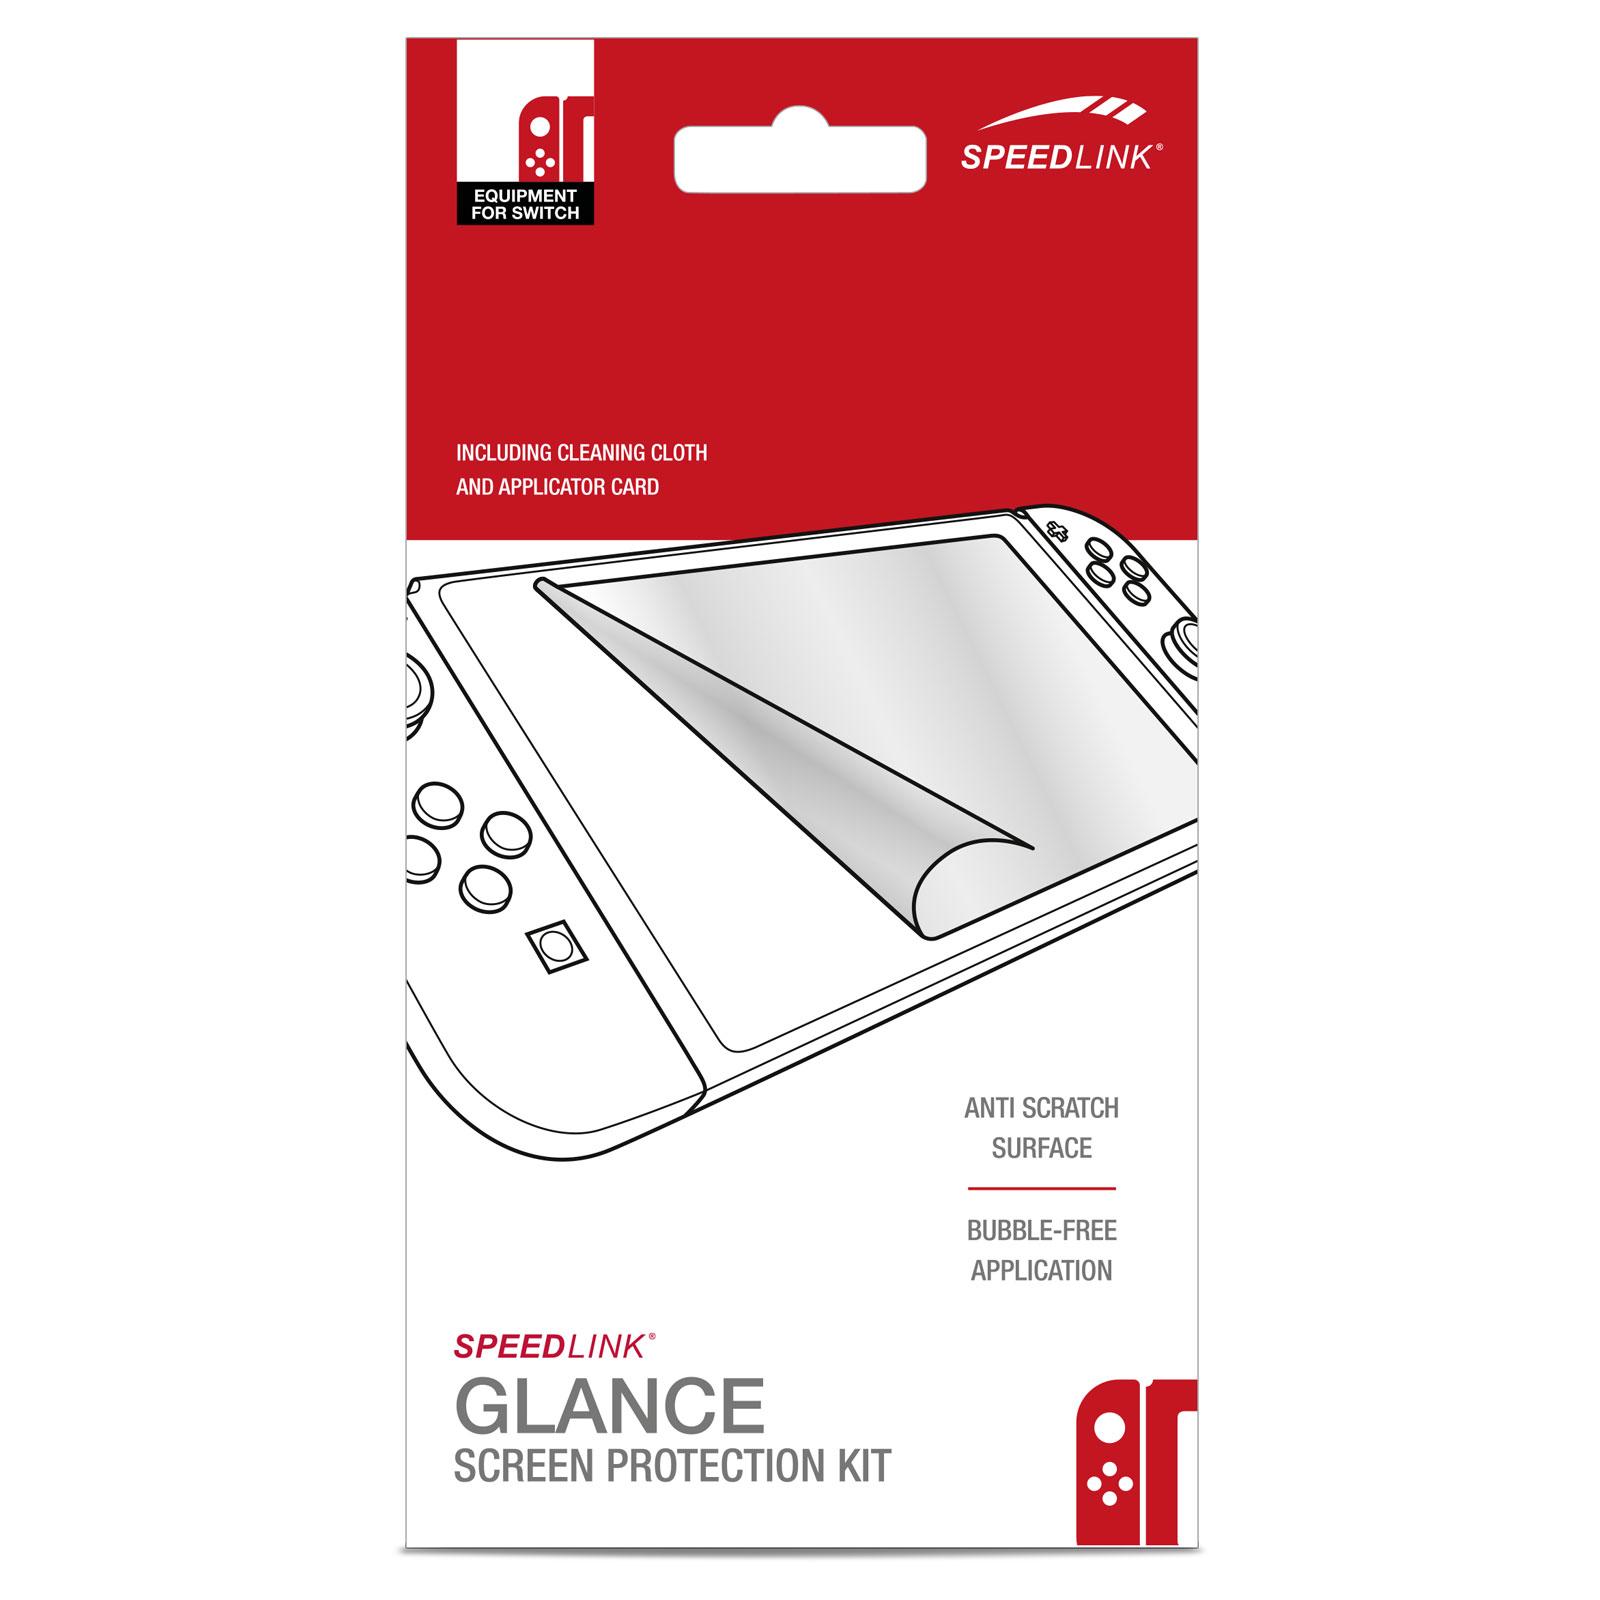 Accessoires Nintendo Switch Speedlink Glance Film protecteur pour Nintendo Switch